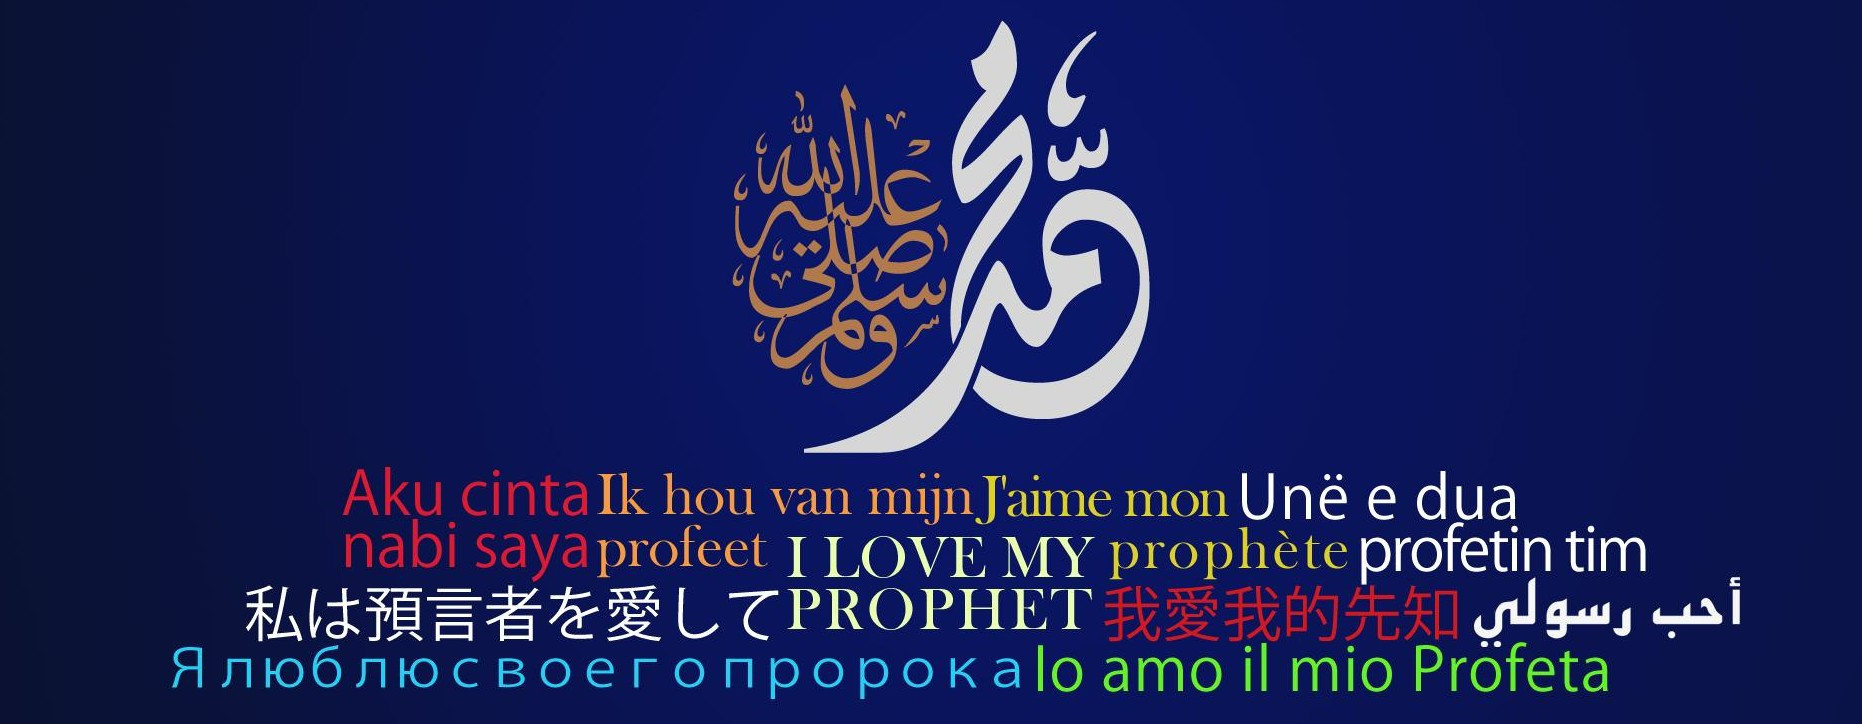 Ramadan with the prophet Muhammad